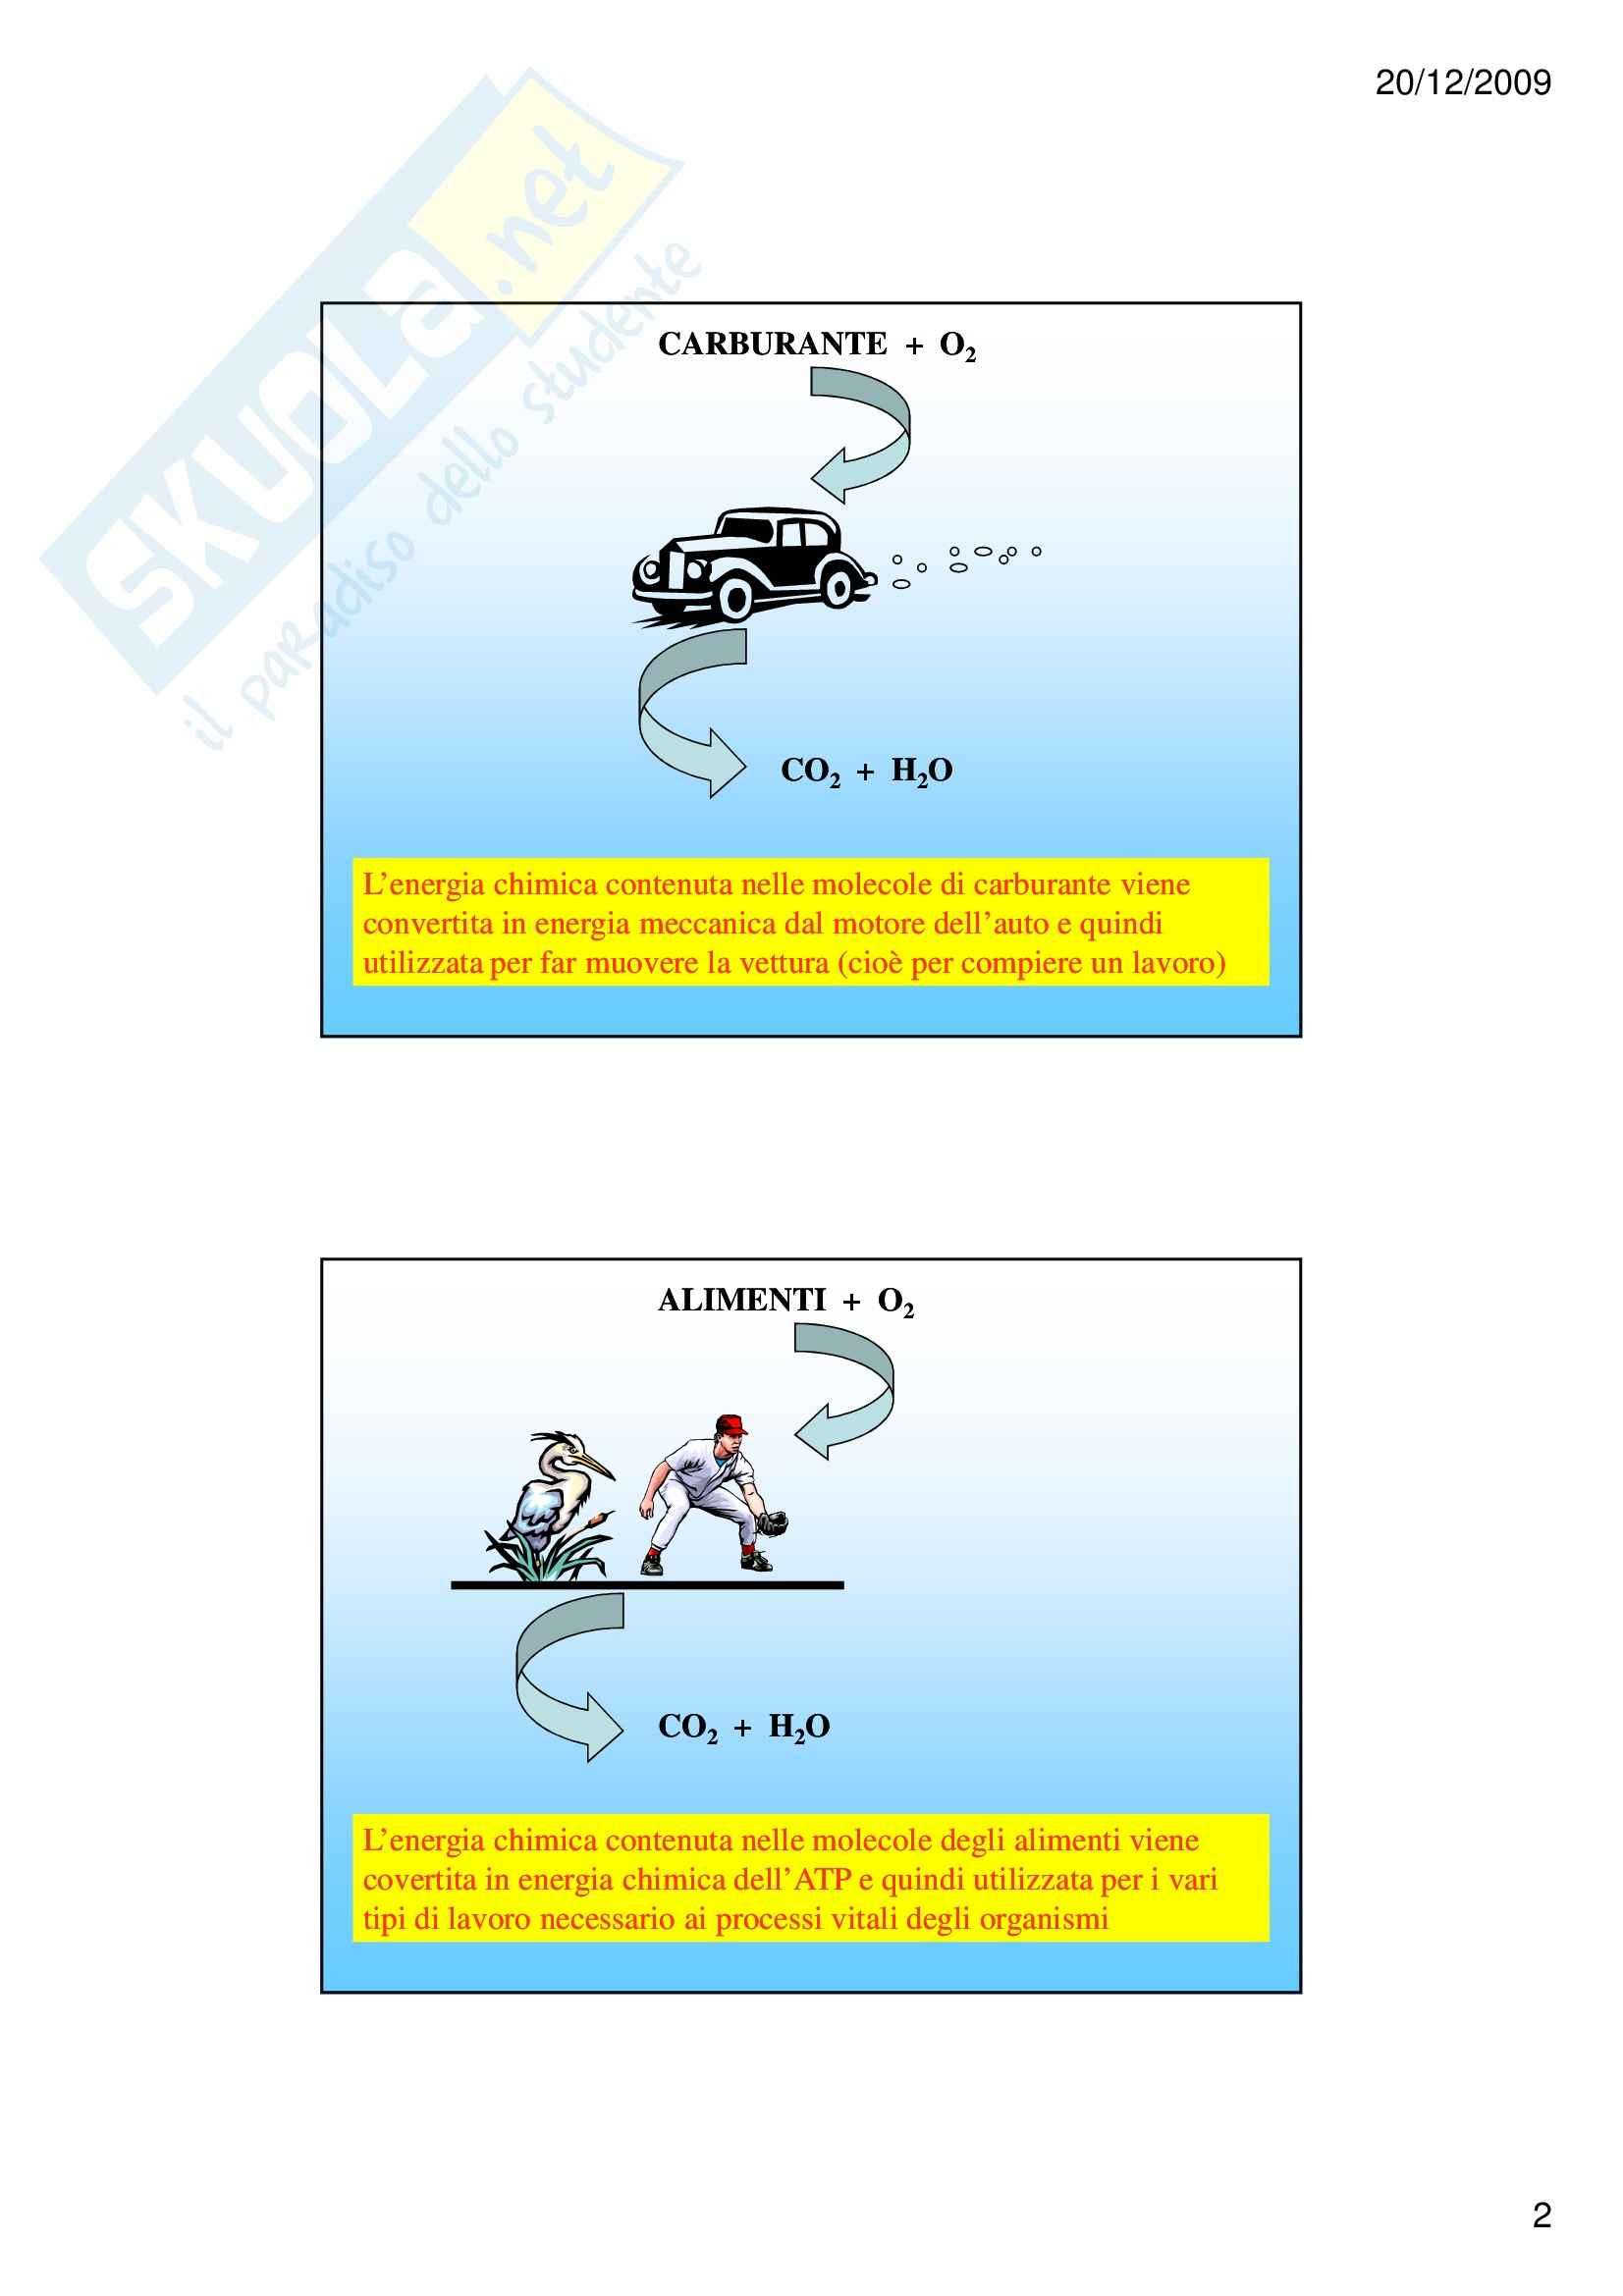 Biochimica I – Metabolismo – Slides Pag. 2